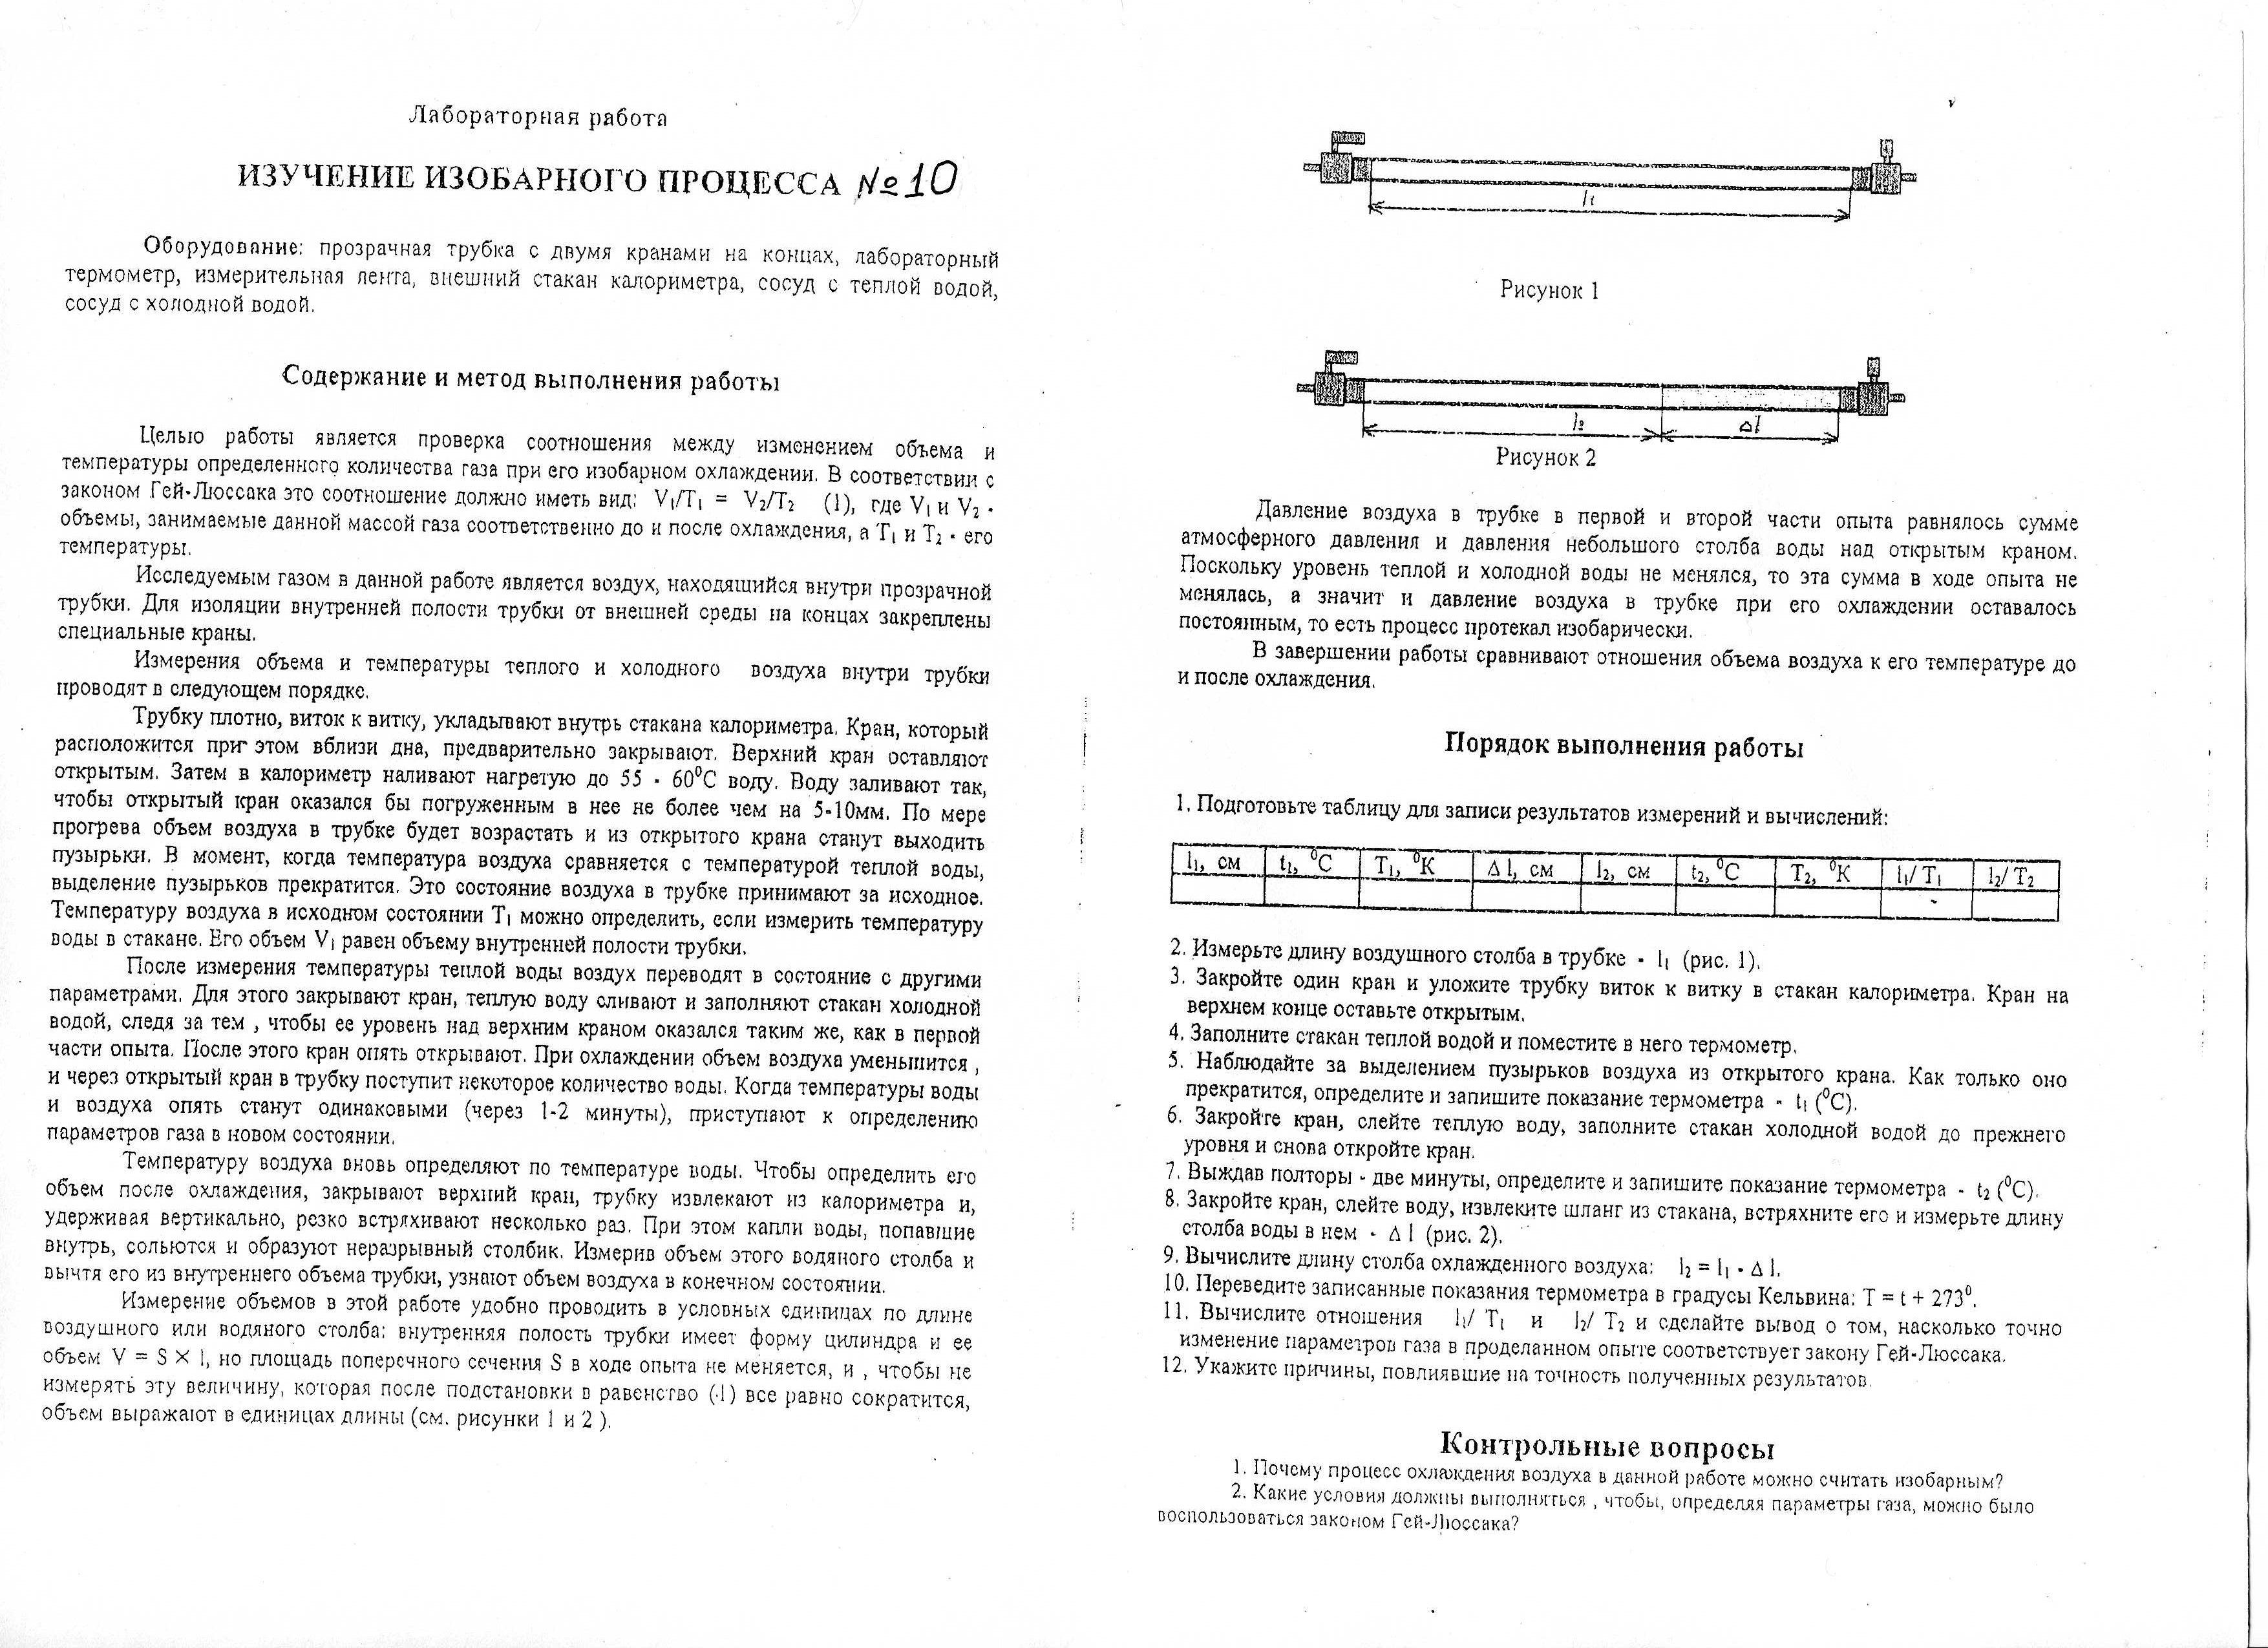 Гдз по русскому языку 4 класс по урозова